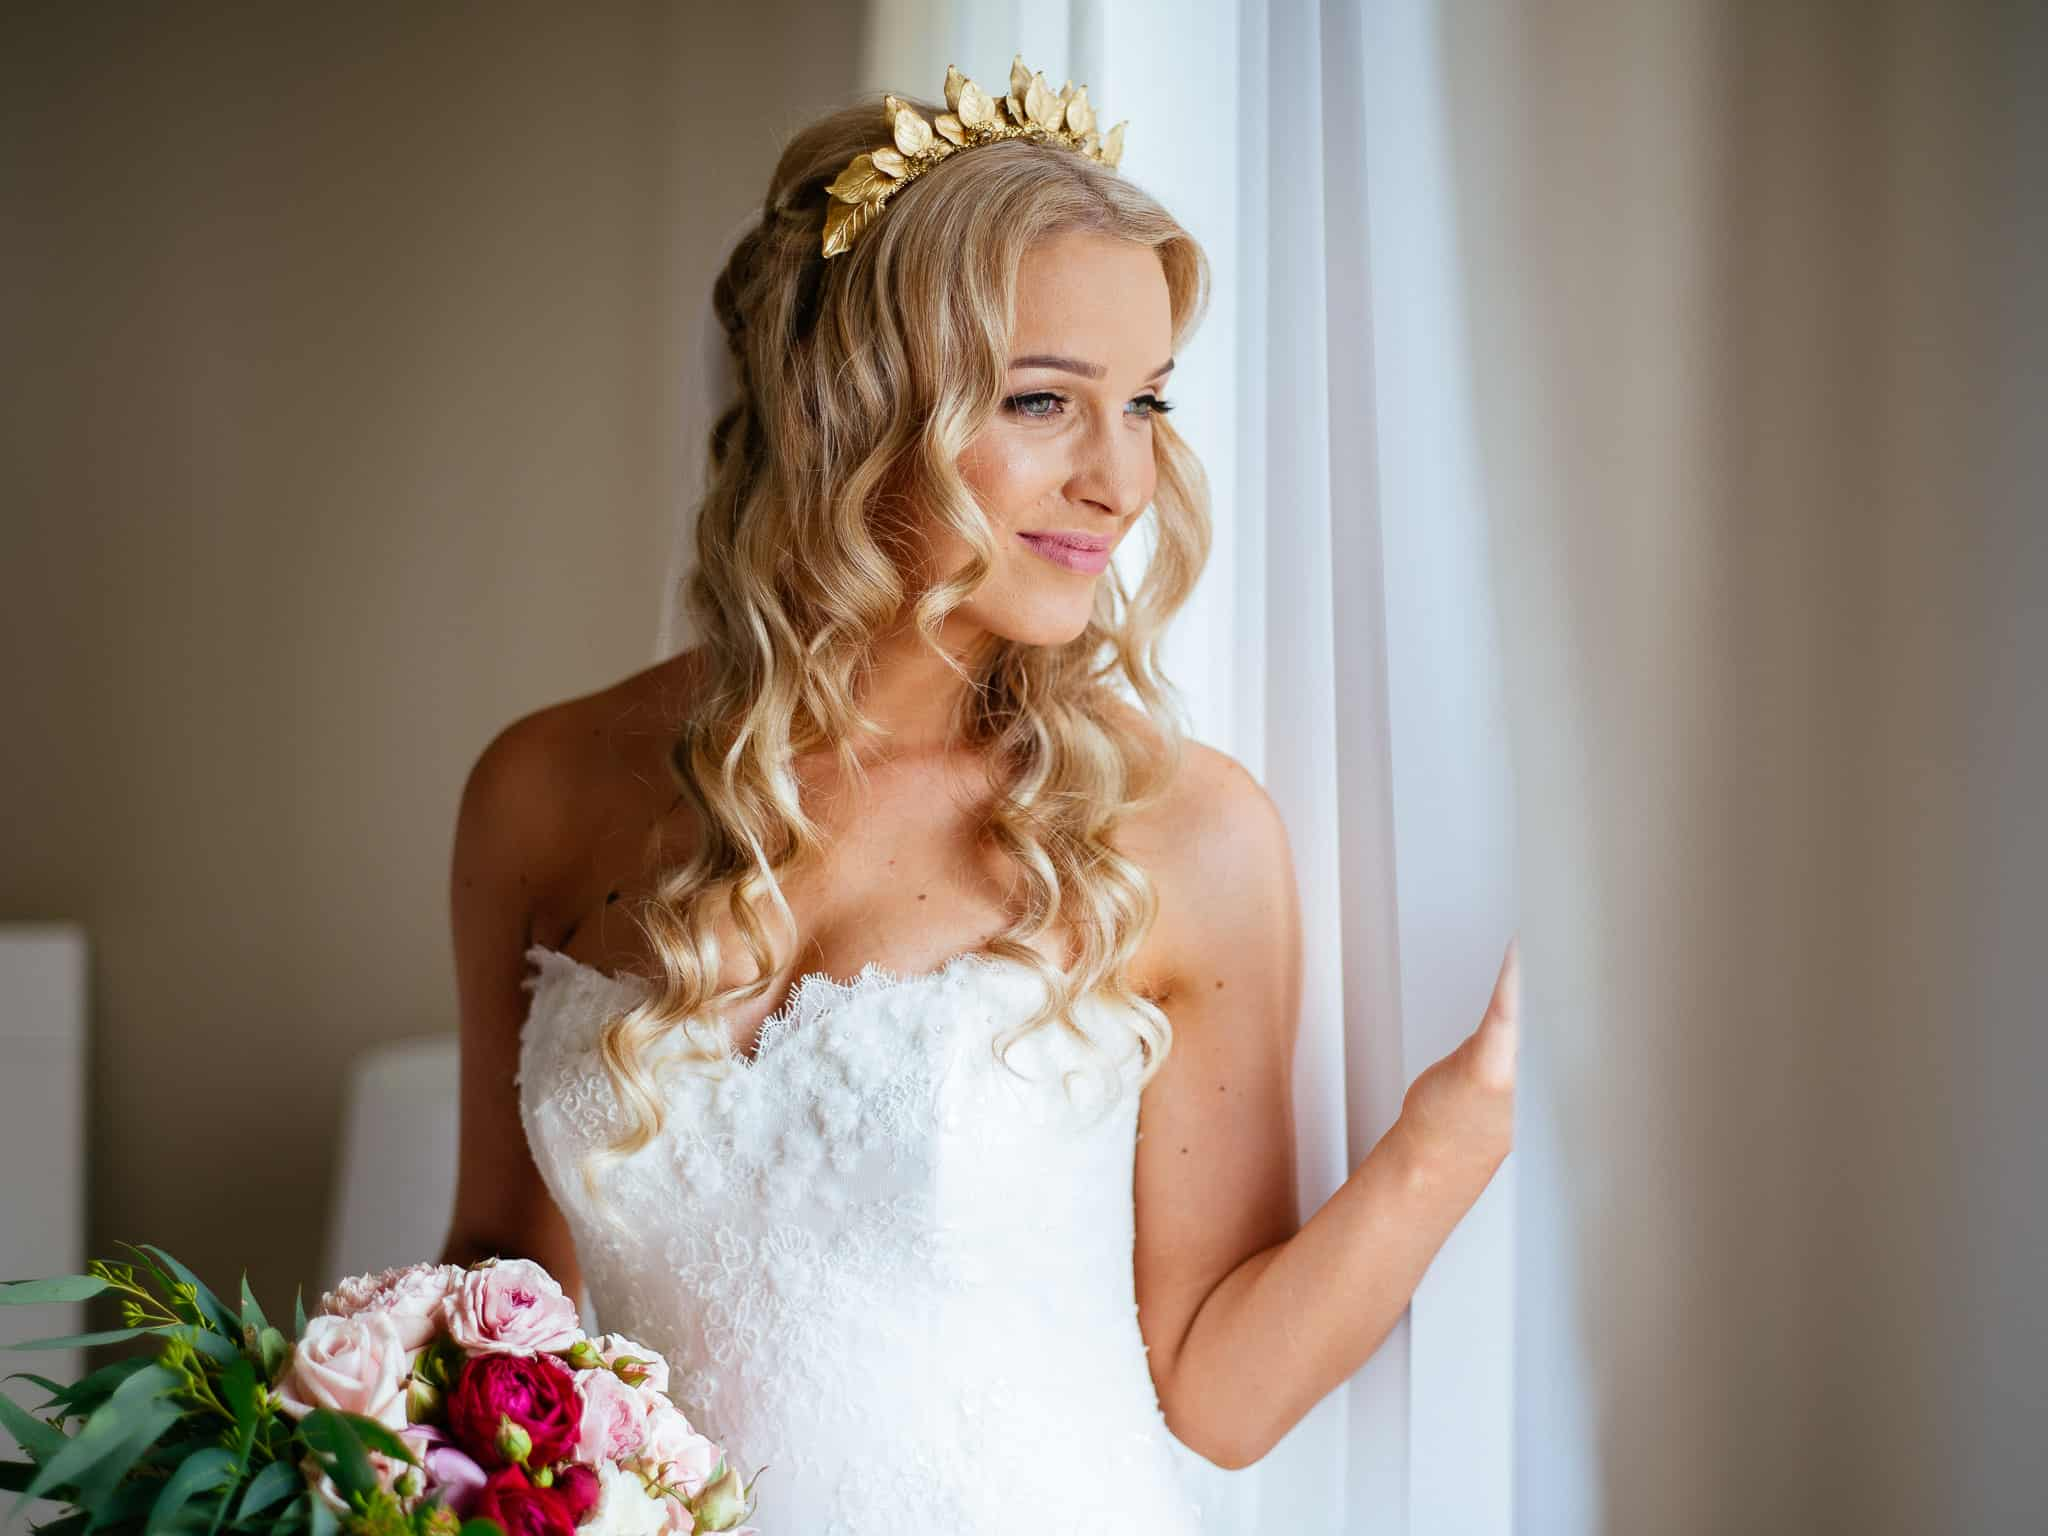 Bowral makeup artist, wedding hair bowral, southern highlands makeup artist, berry makeup artist, kangaroo valley makeup artist, centennial vineyards